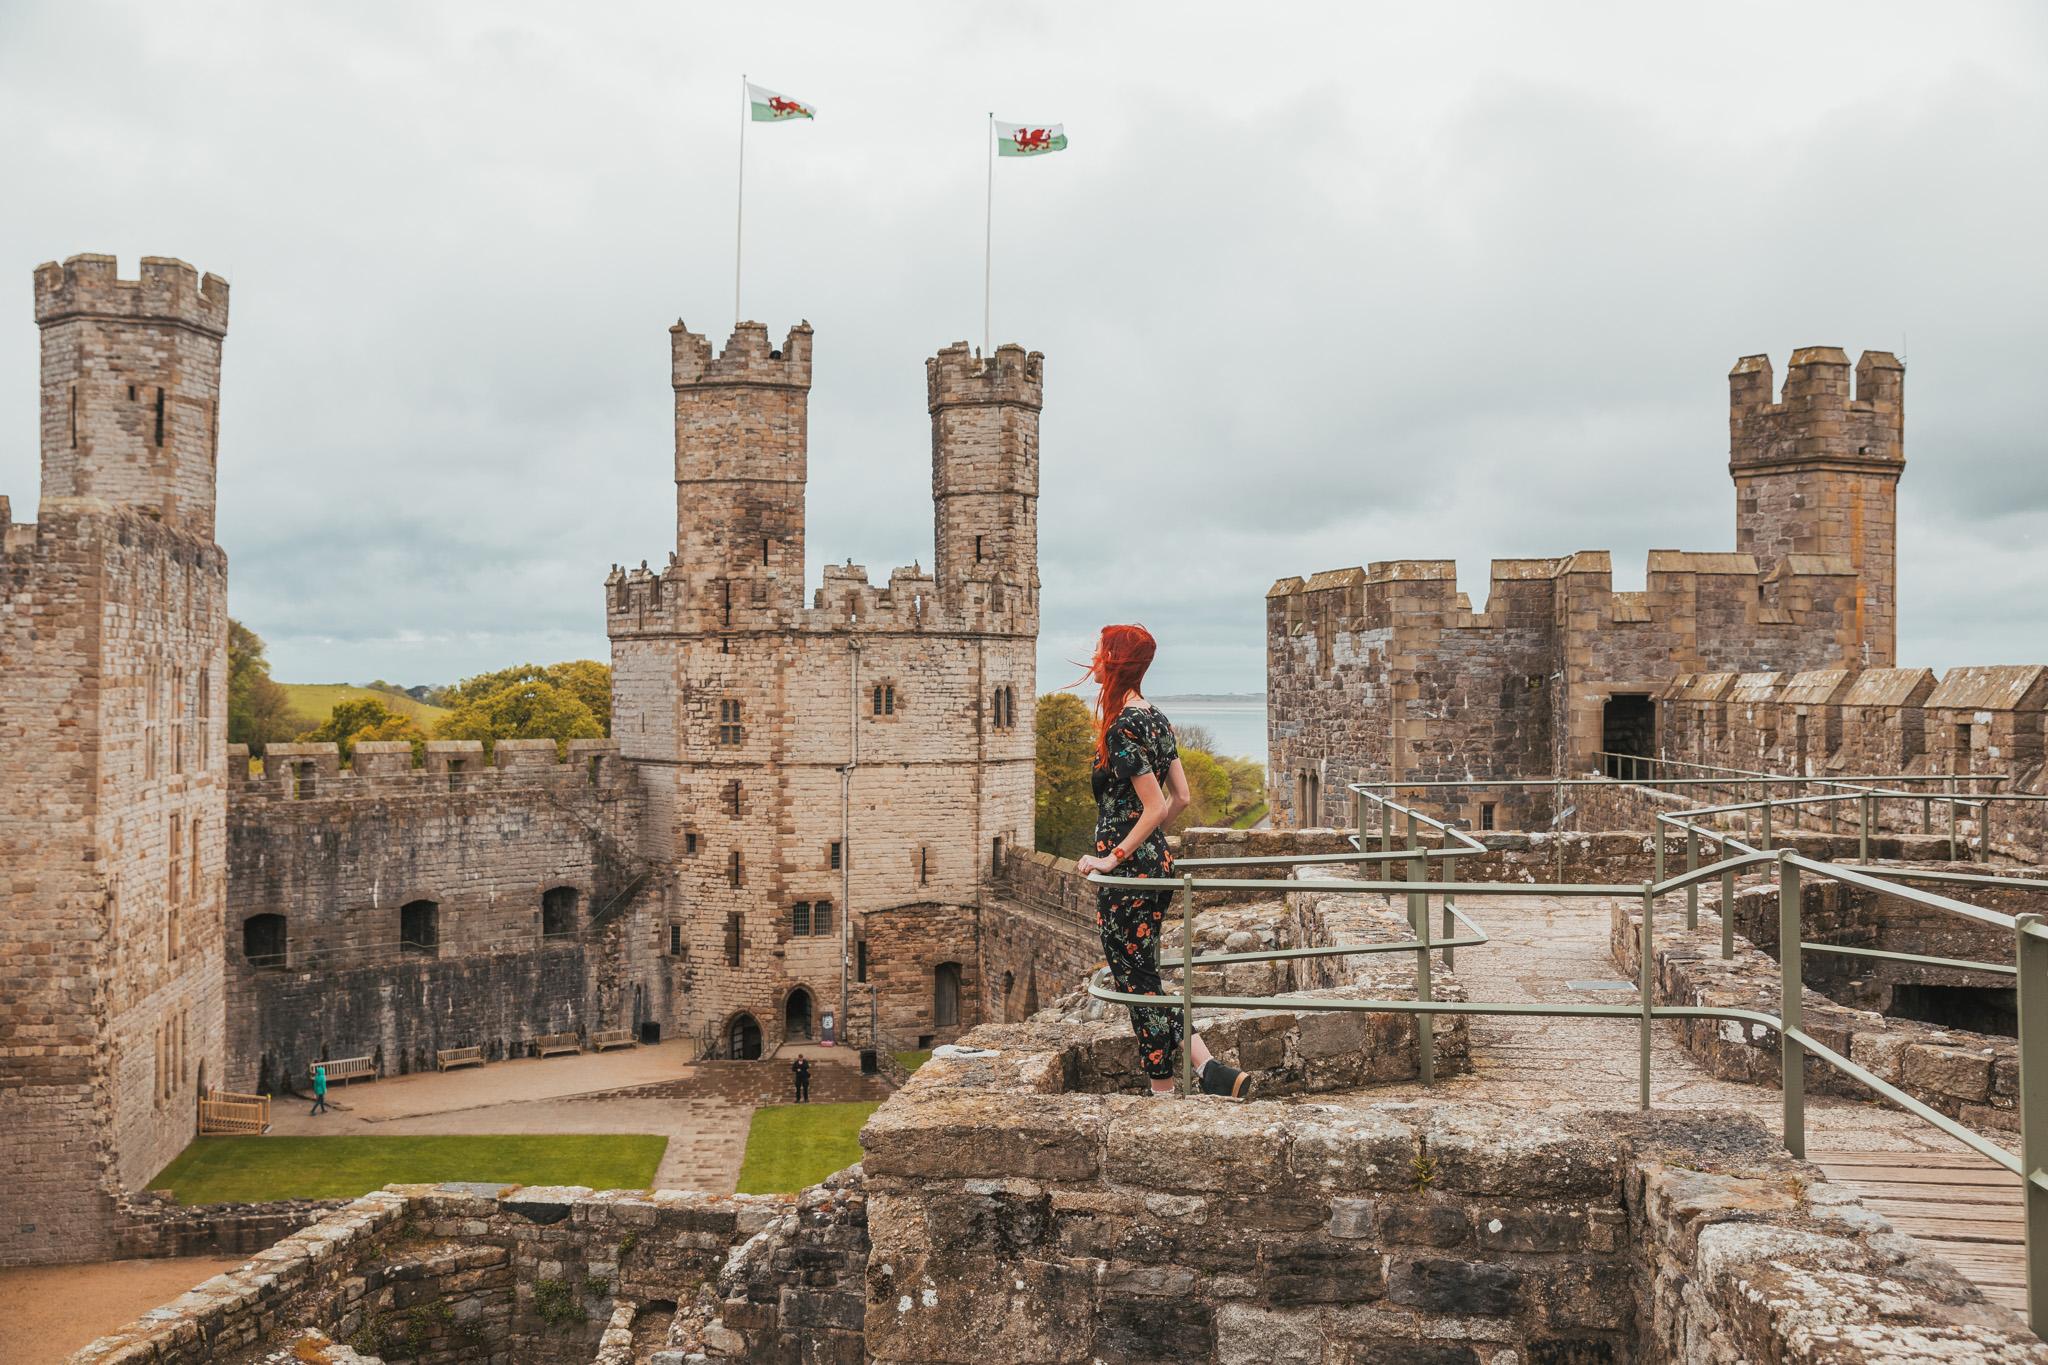 Caernarfon Castle // The Most Beautiful Places to Visit in Wales // #readysetjetset #wales #uk #welsh #travel #photospots #blogpost